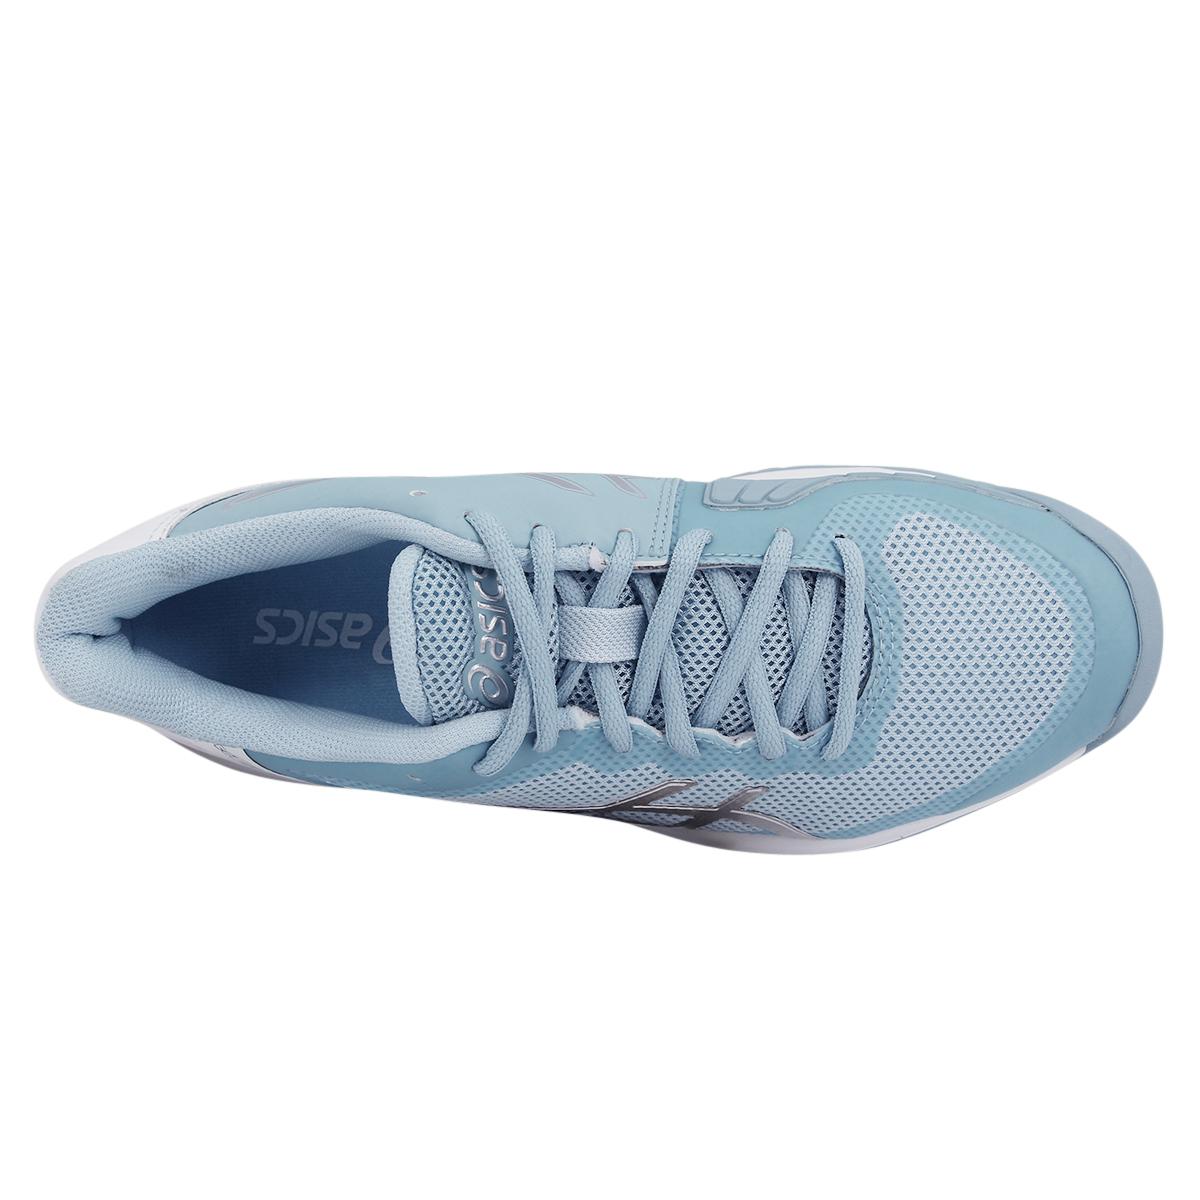 Court tenis Speed  Gel Nuevo Asics Mujer Zapatillas de Owq7II